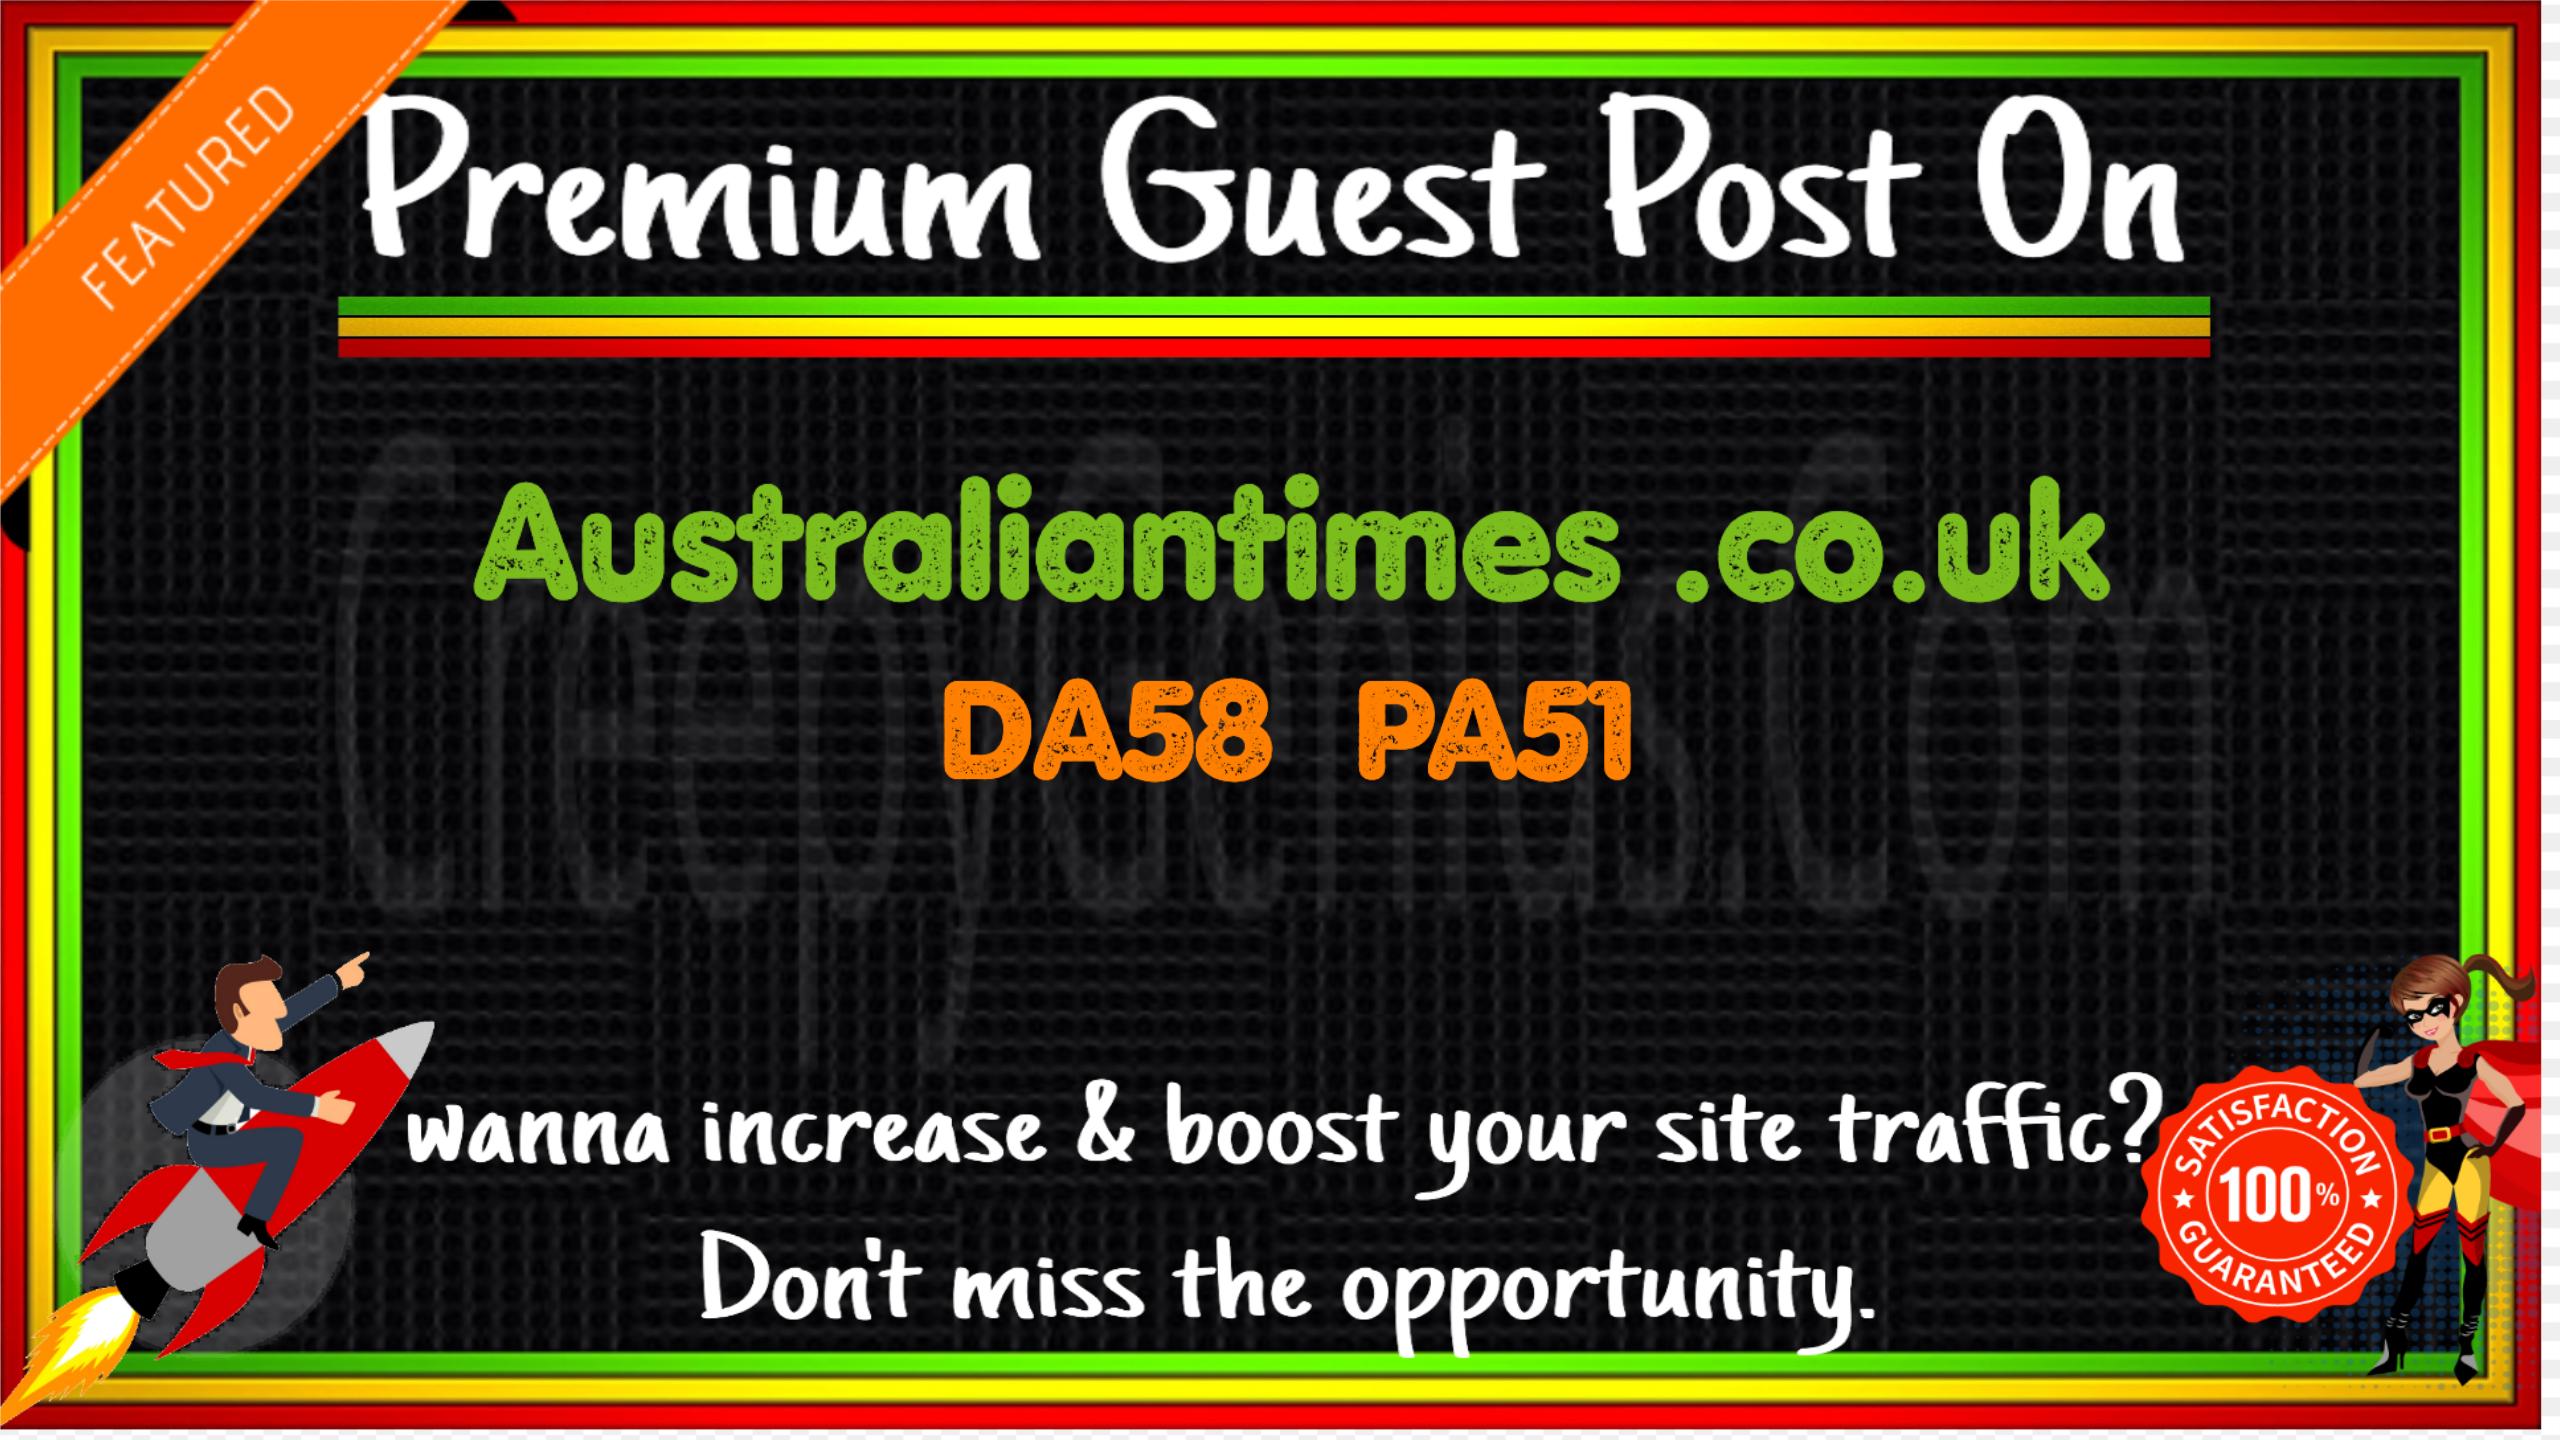 Write & Publish A Guest Post On Australiantimes. co. uk DA58 PA51